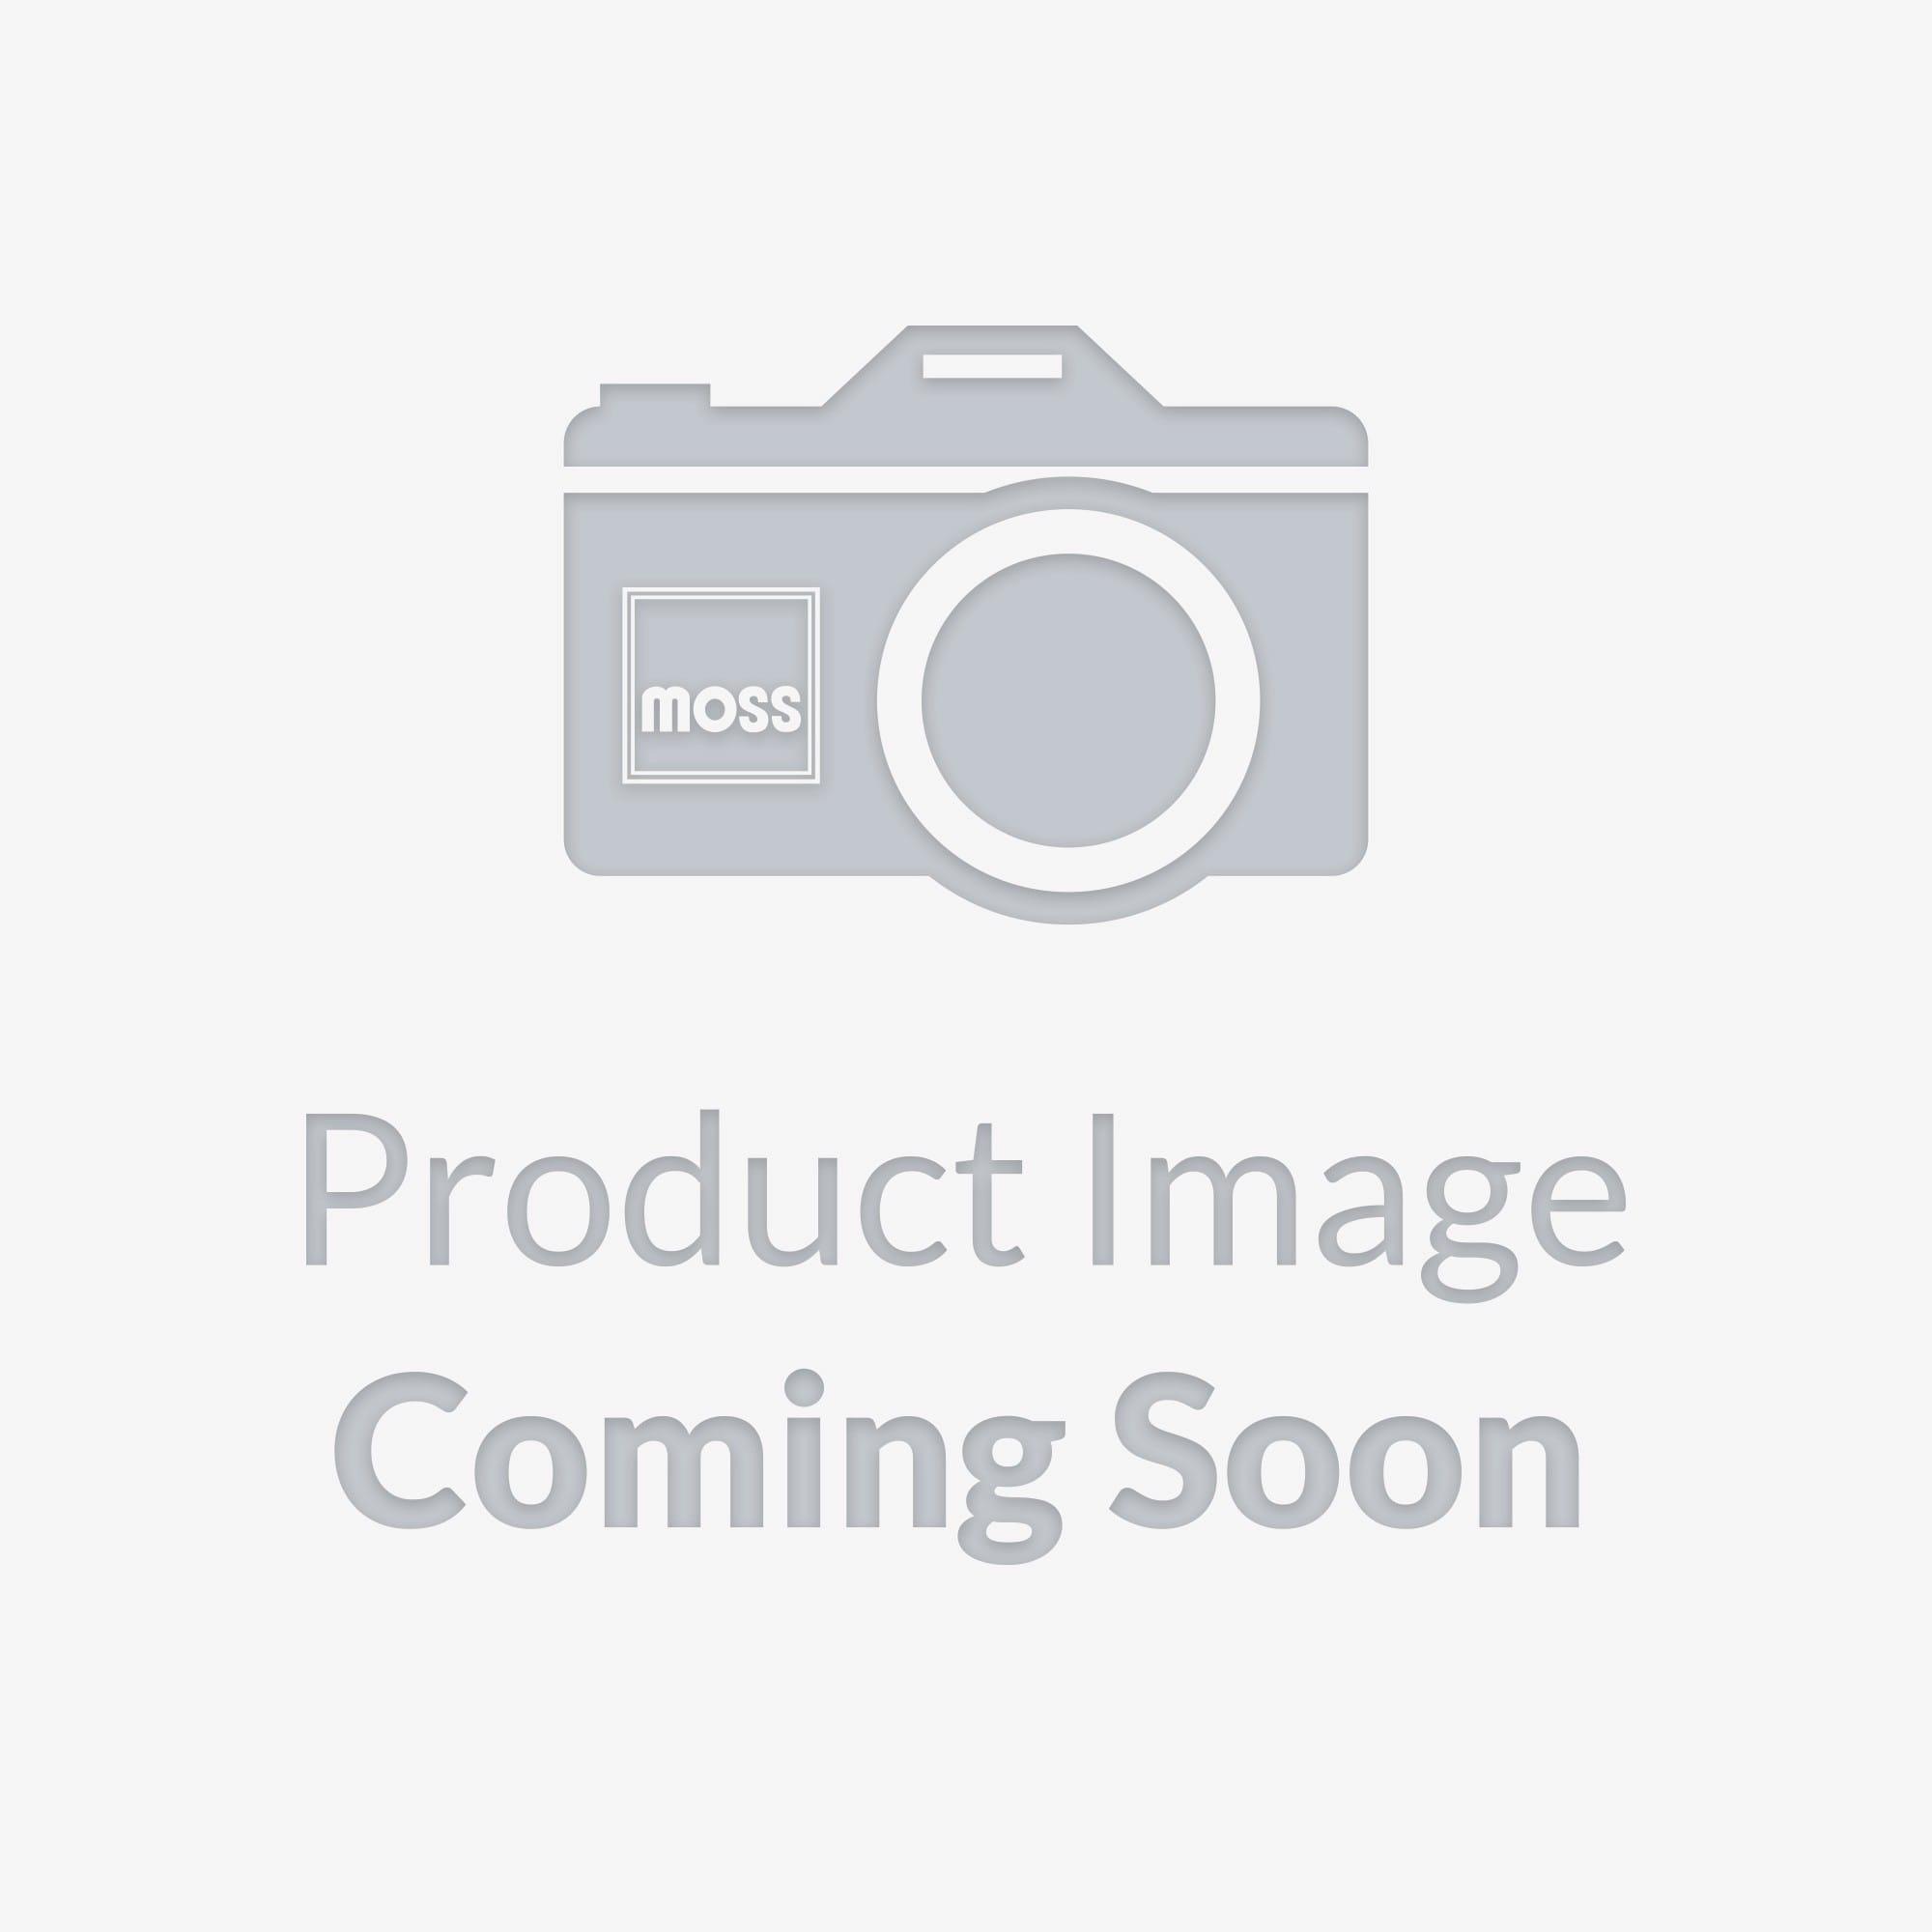 Jaguar XK120, XK140, XK150 Restoration Parts and Accessories